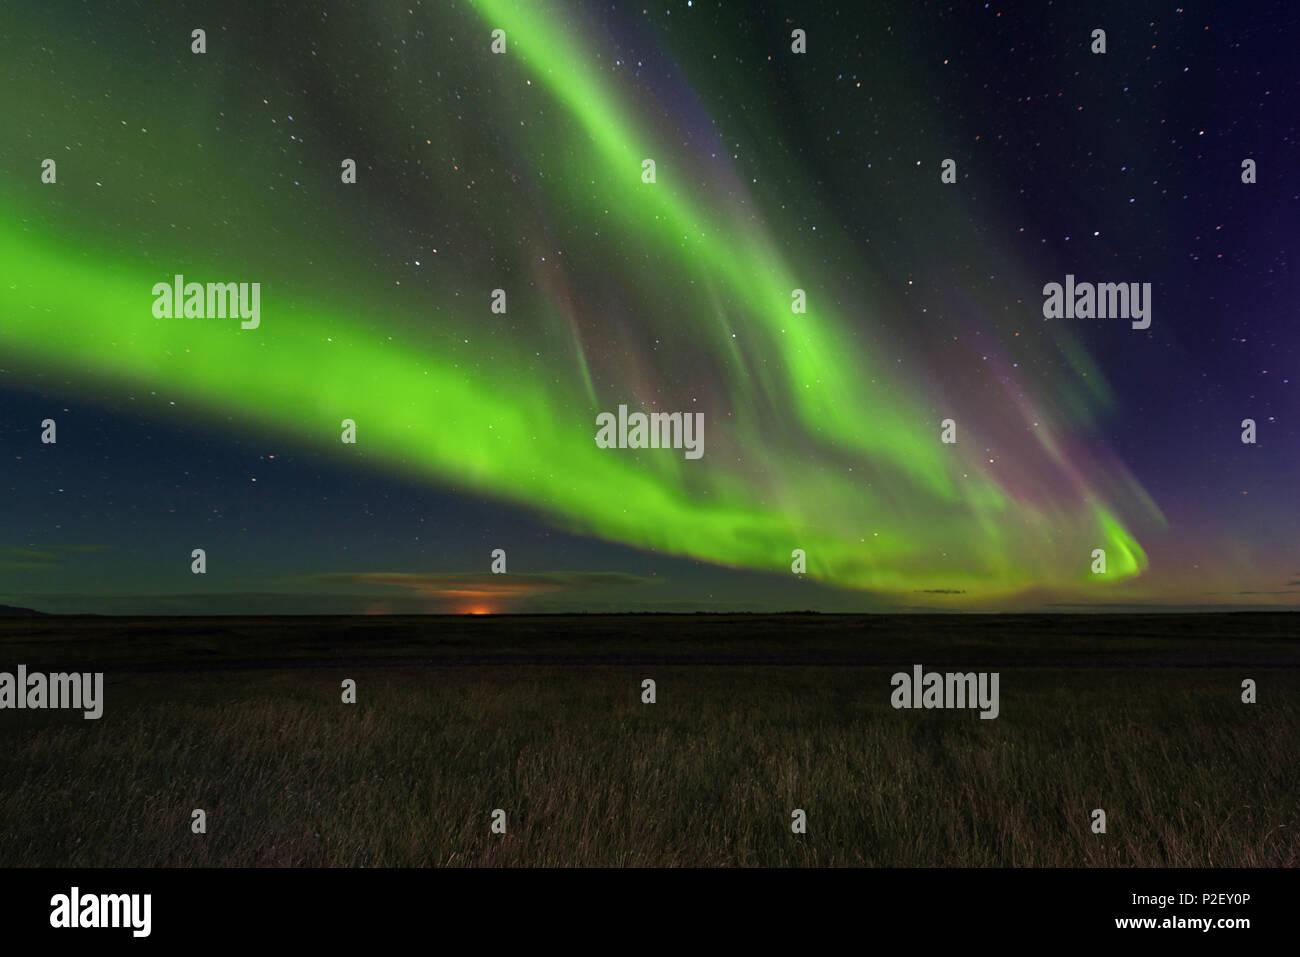 Aurora Borealis, Northern Lights, At Night, Sky, Stars, Iceland, Europe - Stock Image